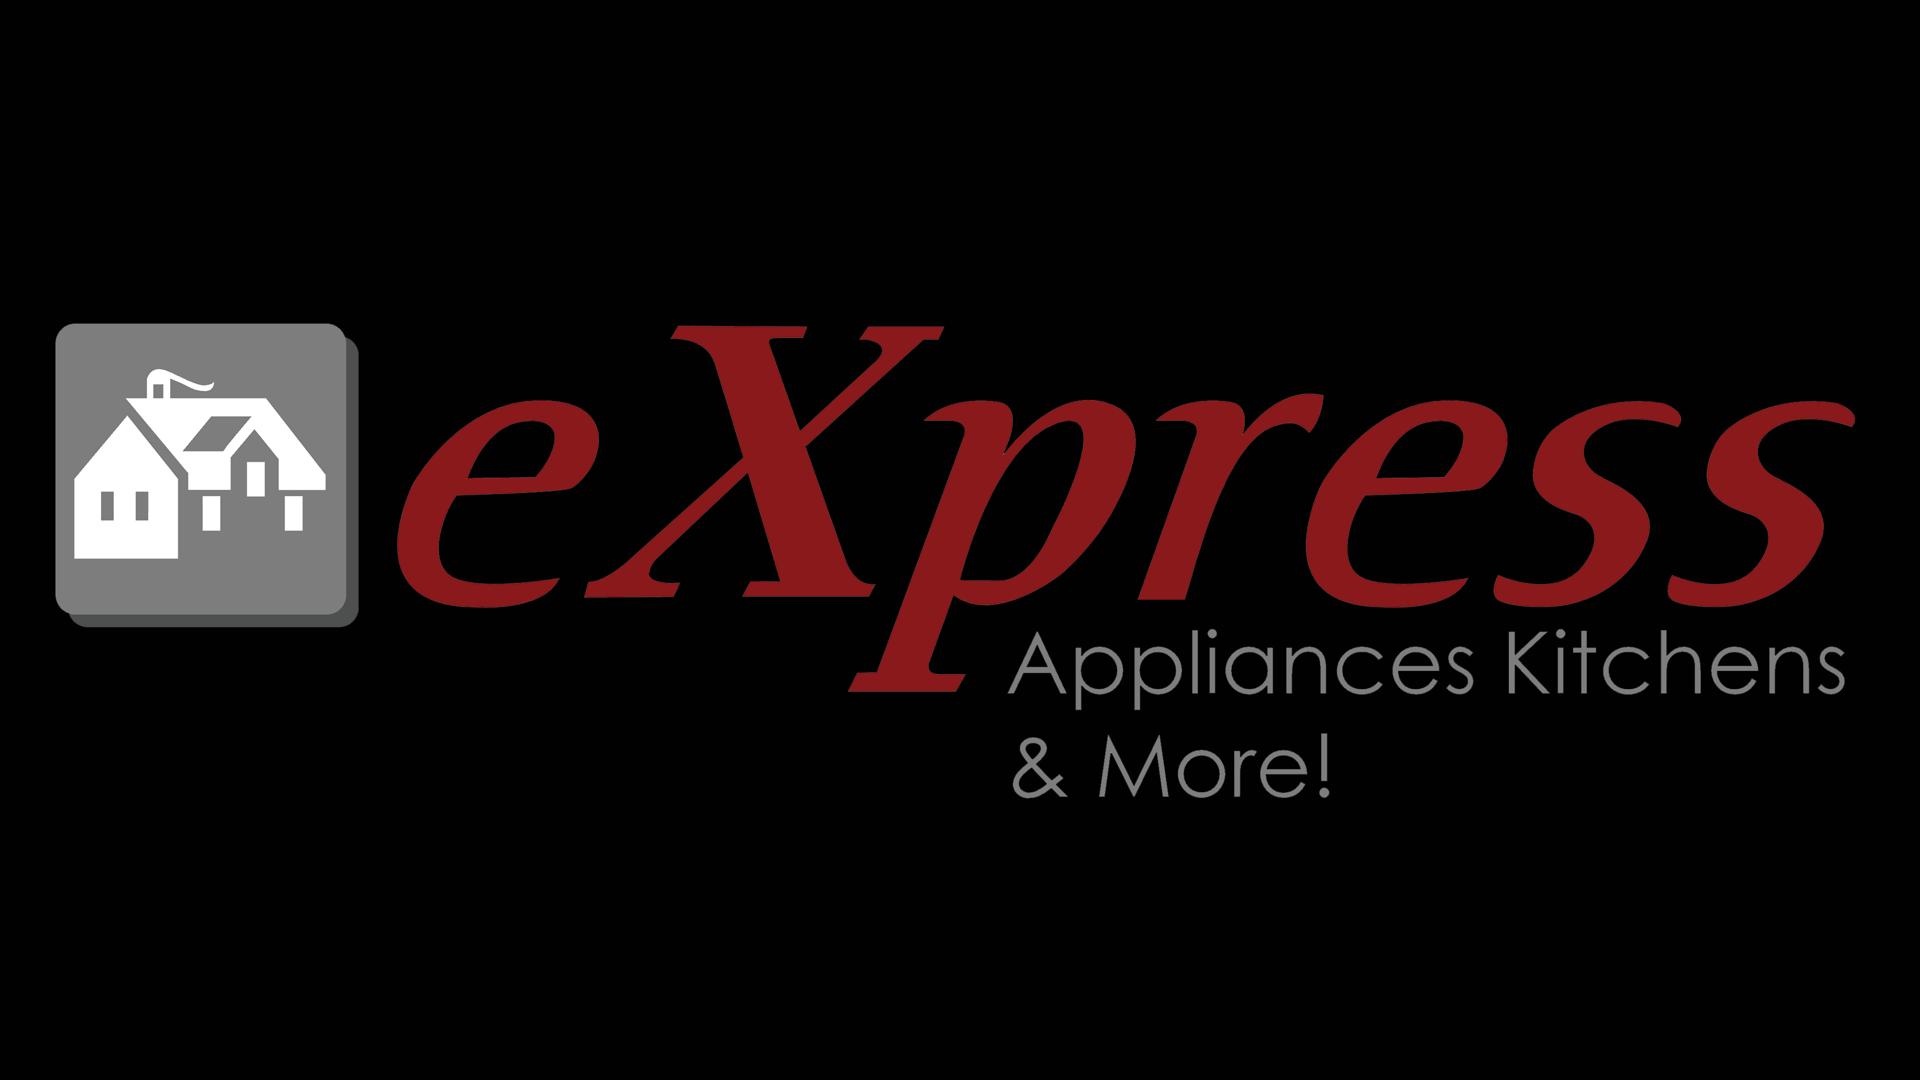 Express Appliances, Kitchens & More